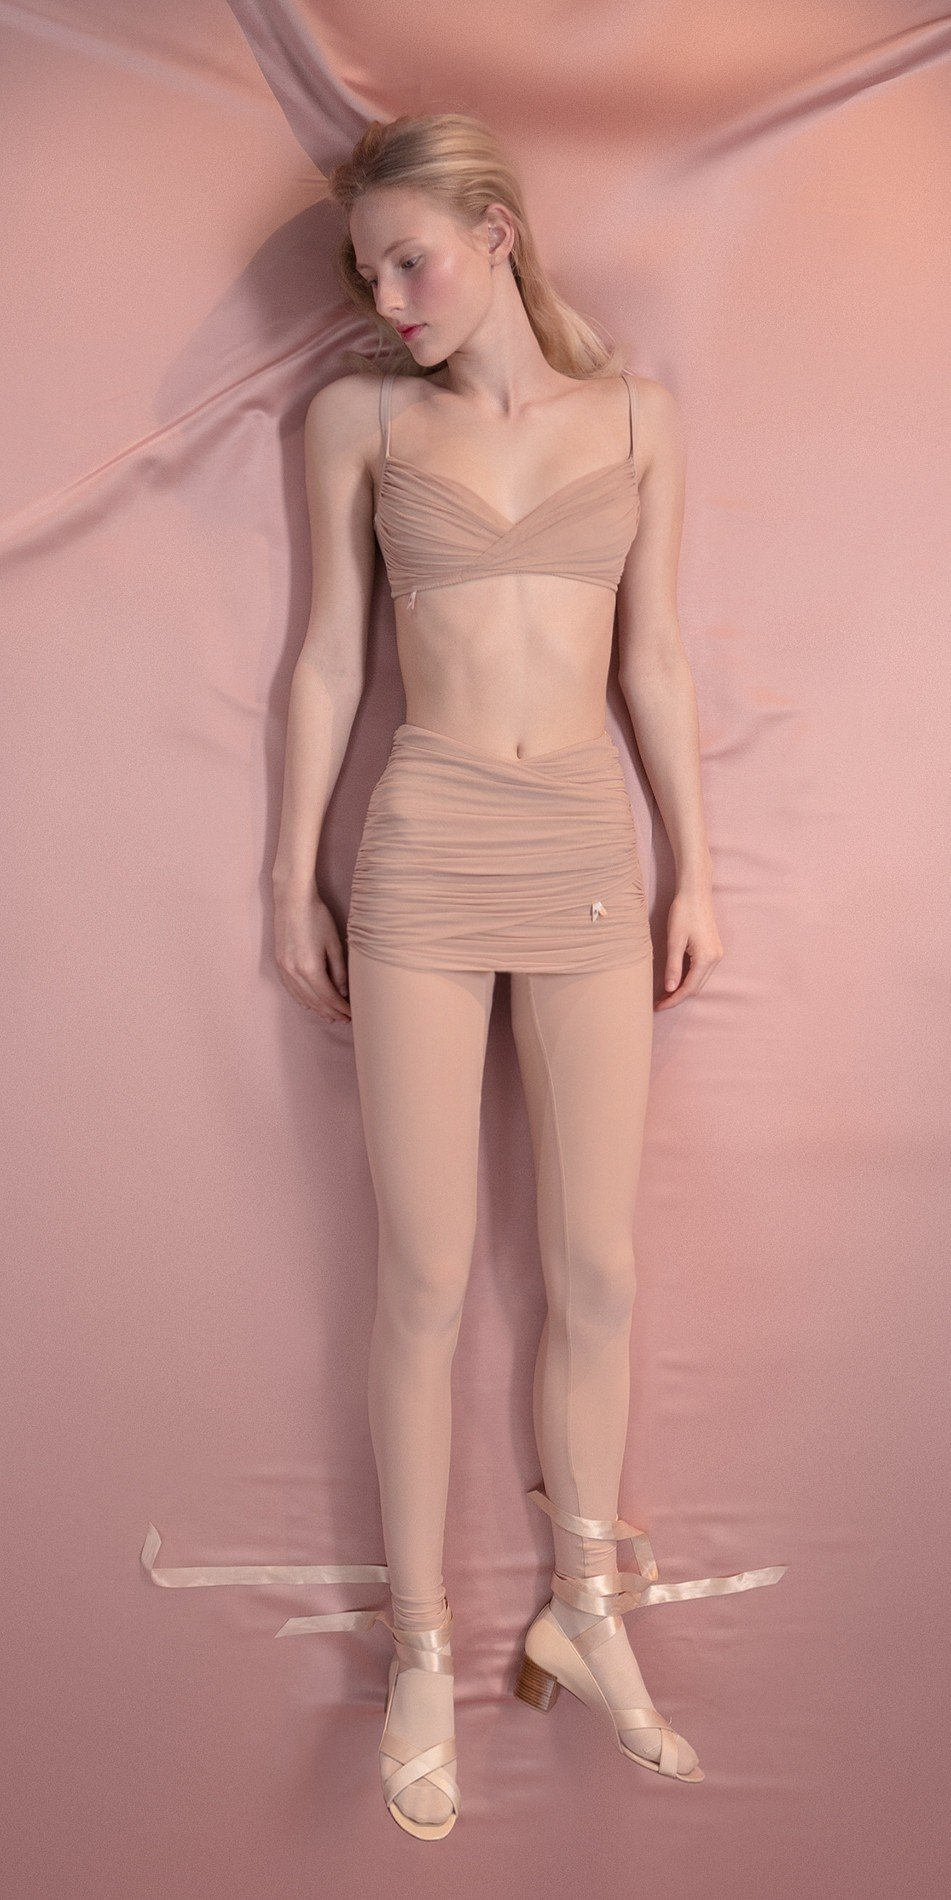 GRES leggings20with20draped20wrap20mini20skirt nude 1 r 1